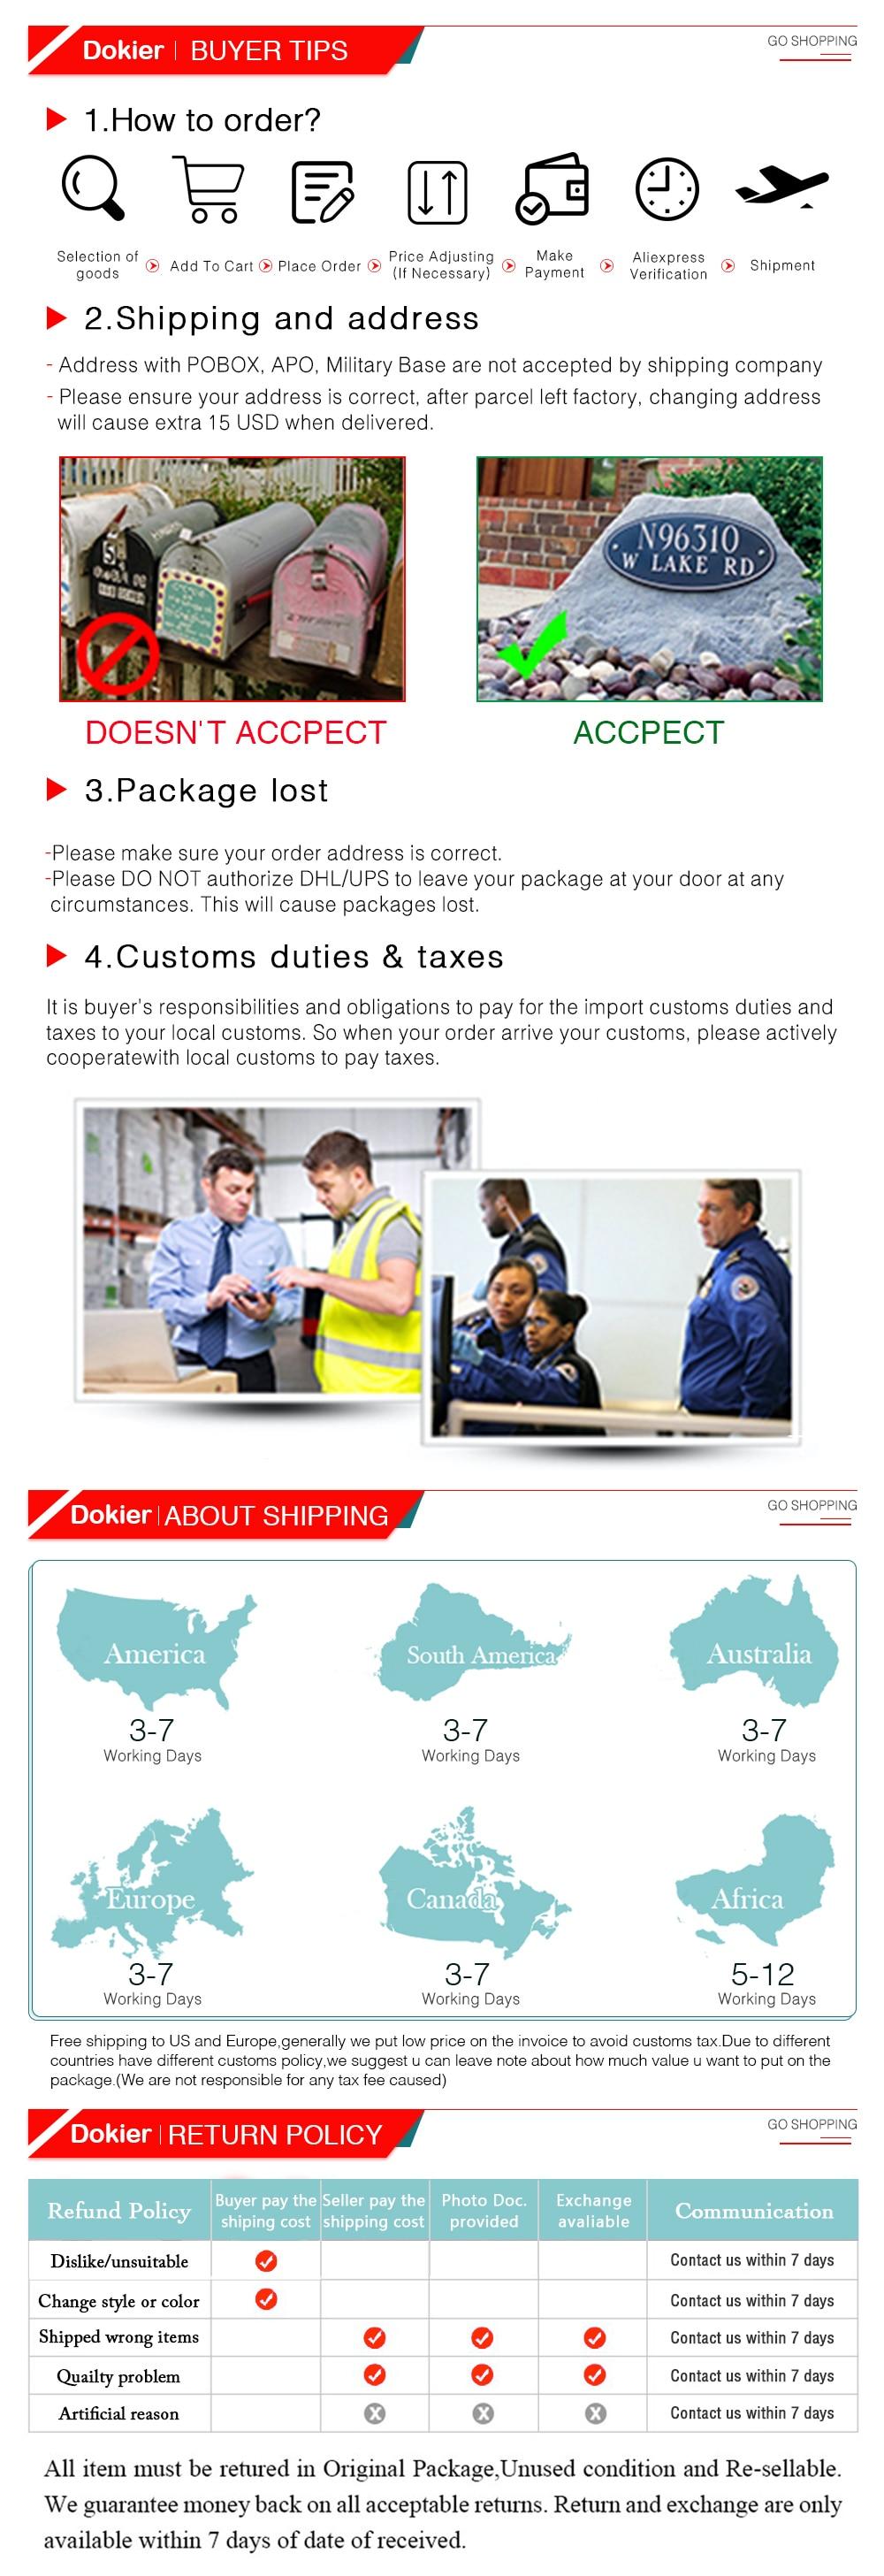 customer tips